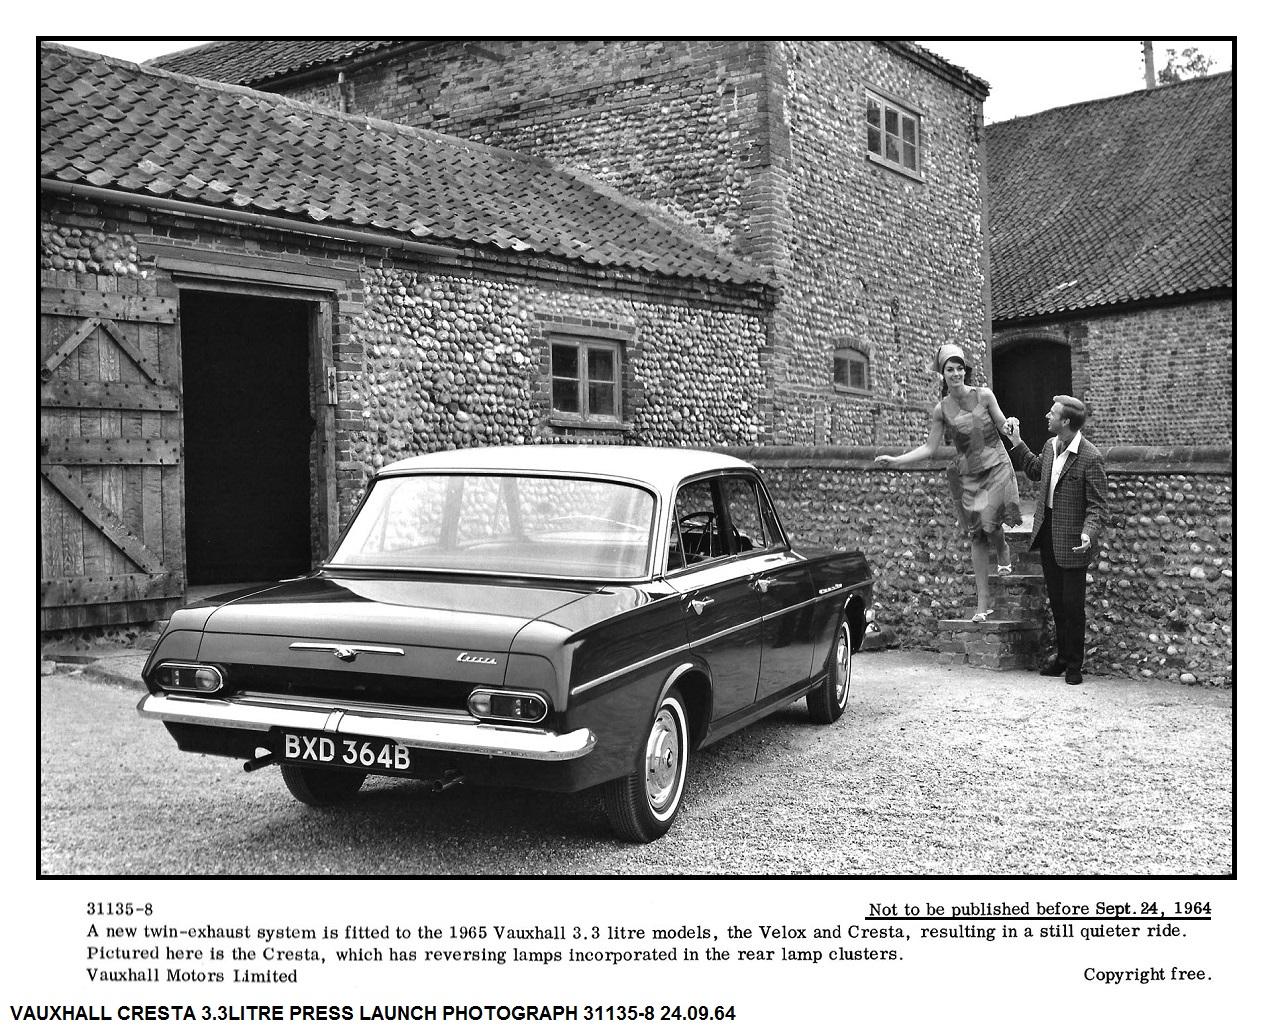 vauxhall pb velox cresta rh vauxpedianet uk2sitebuilder com Vauxhall Calibra 1950 Vauxhall Cresta